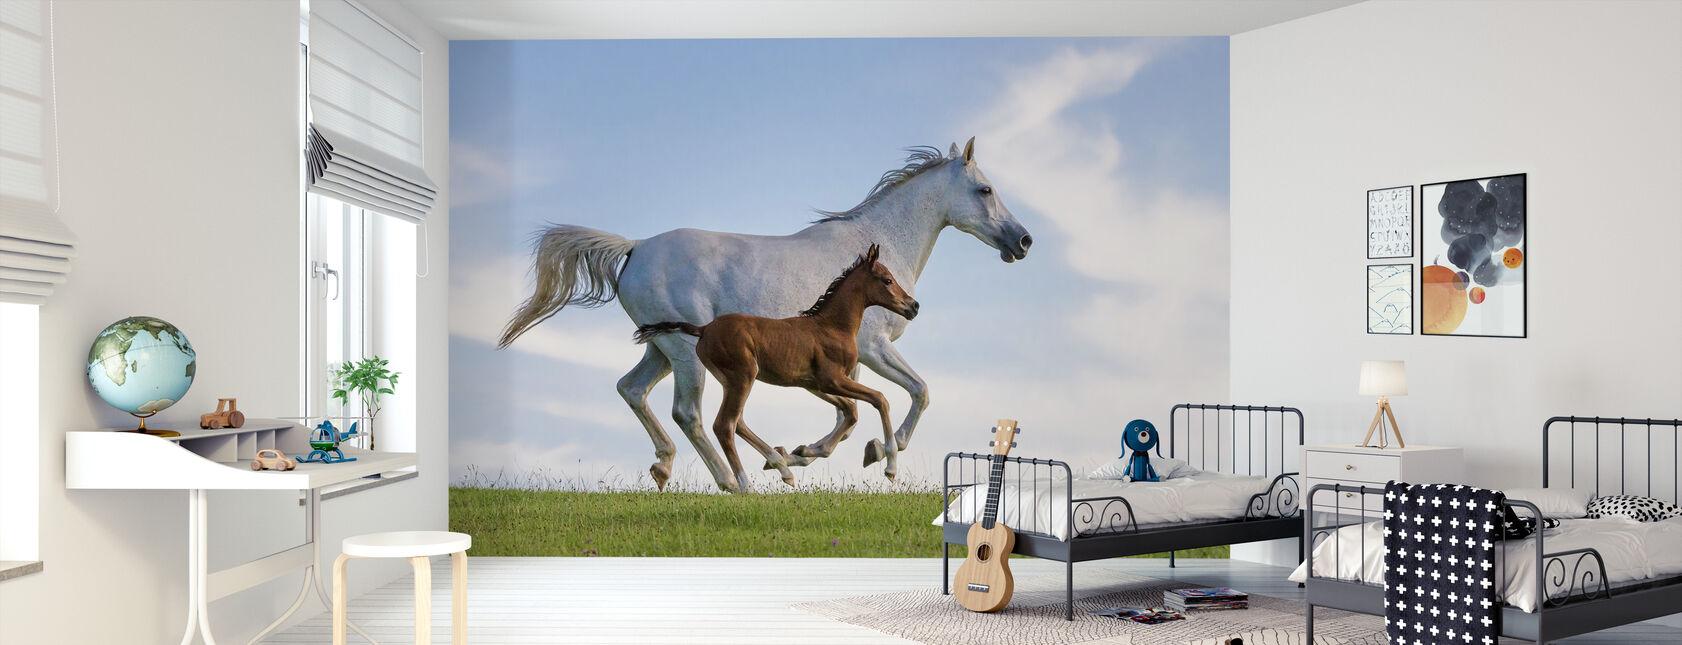 Purebred Arabian Horse Galloping - Wallpaper - Kids Room